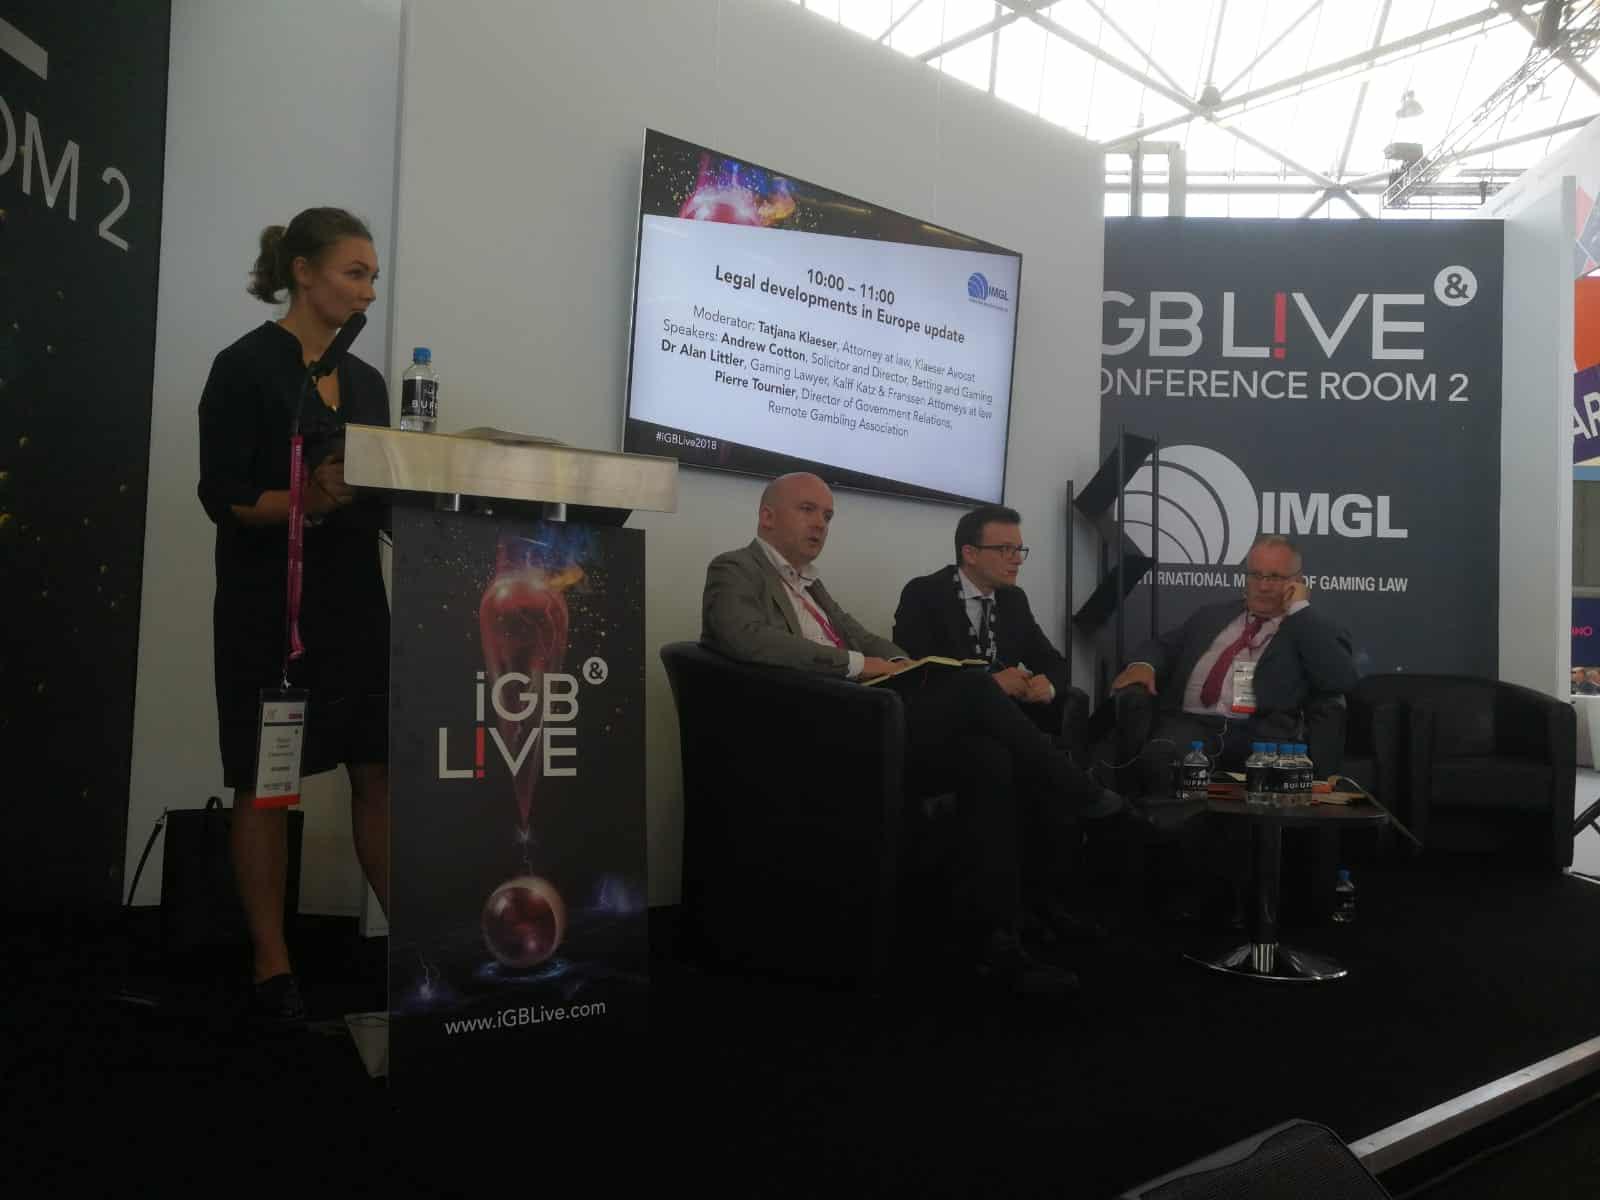 Sessie over regulering in Europa tijdens IGB Live! in Amsterdam